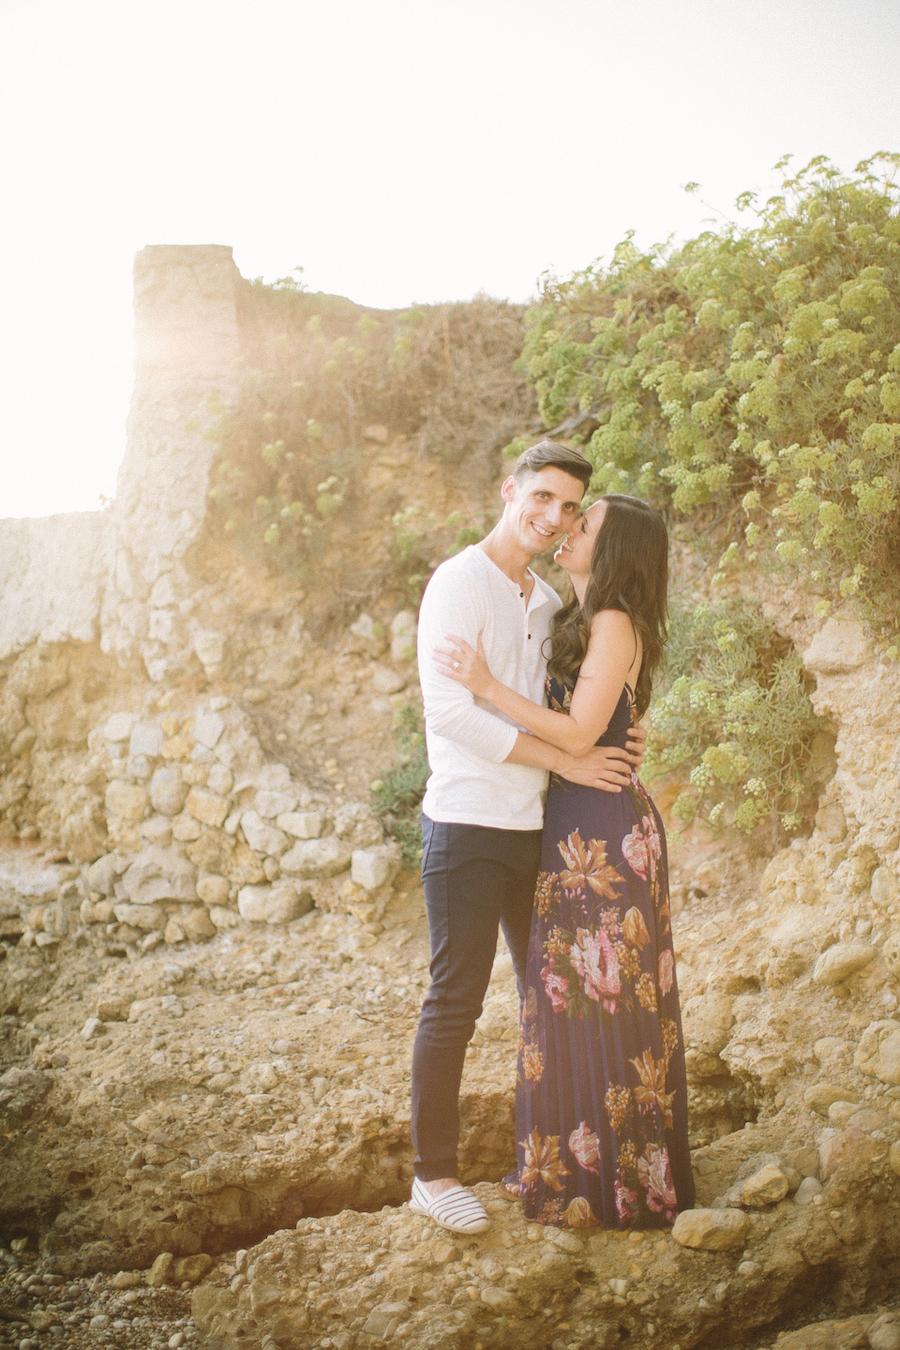 saya-photography-french-riviera-pre-wedding-by-sea-66.jpg